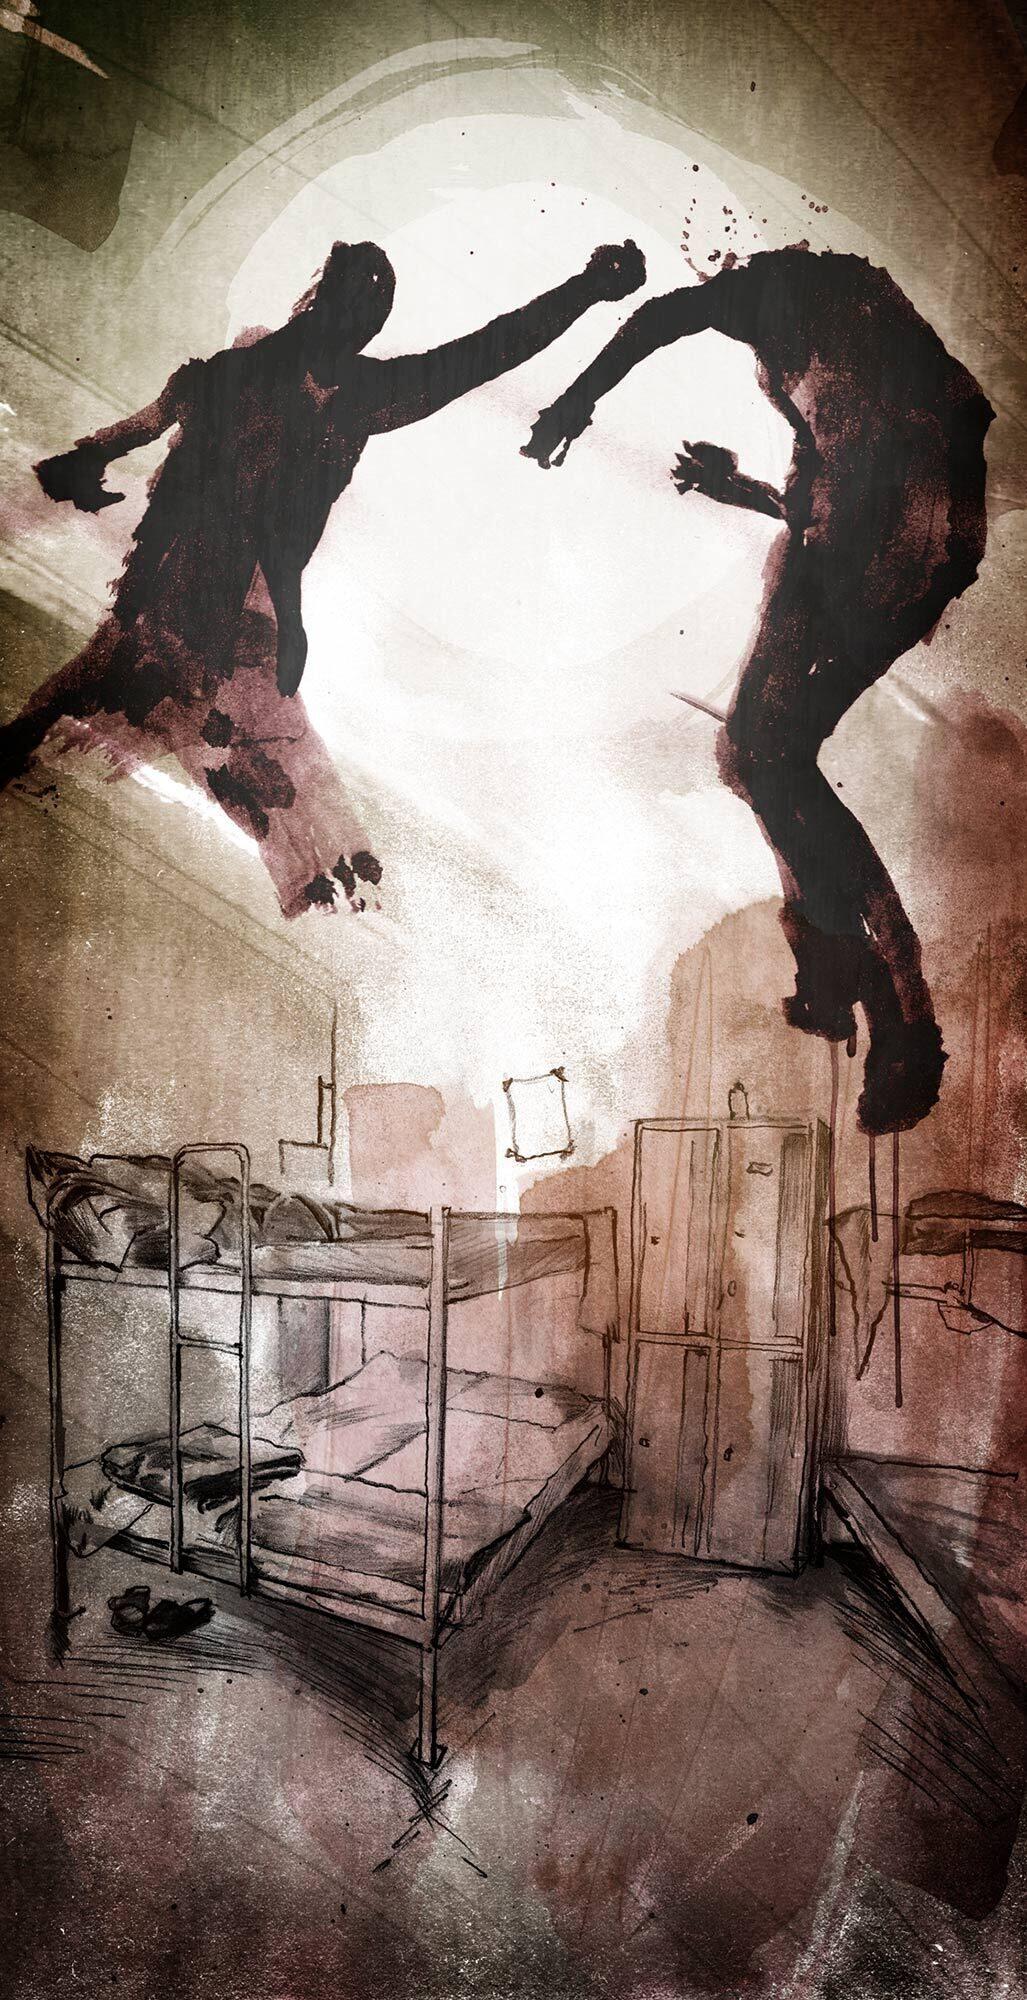 Asylheim Gewalt Illustration - Kornel Illustration | Kornel Stadler portfolio